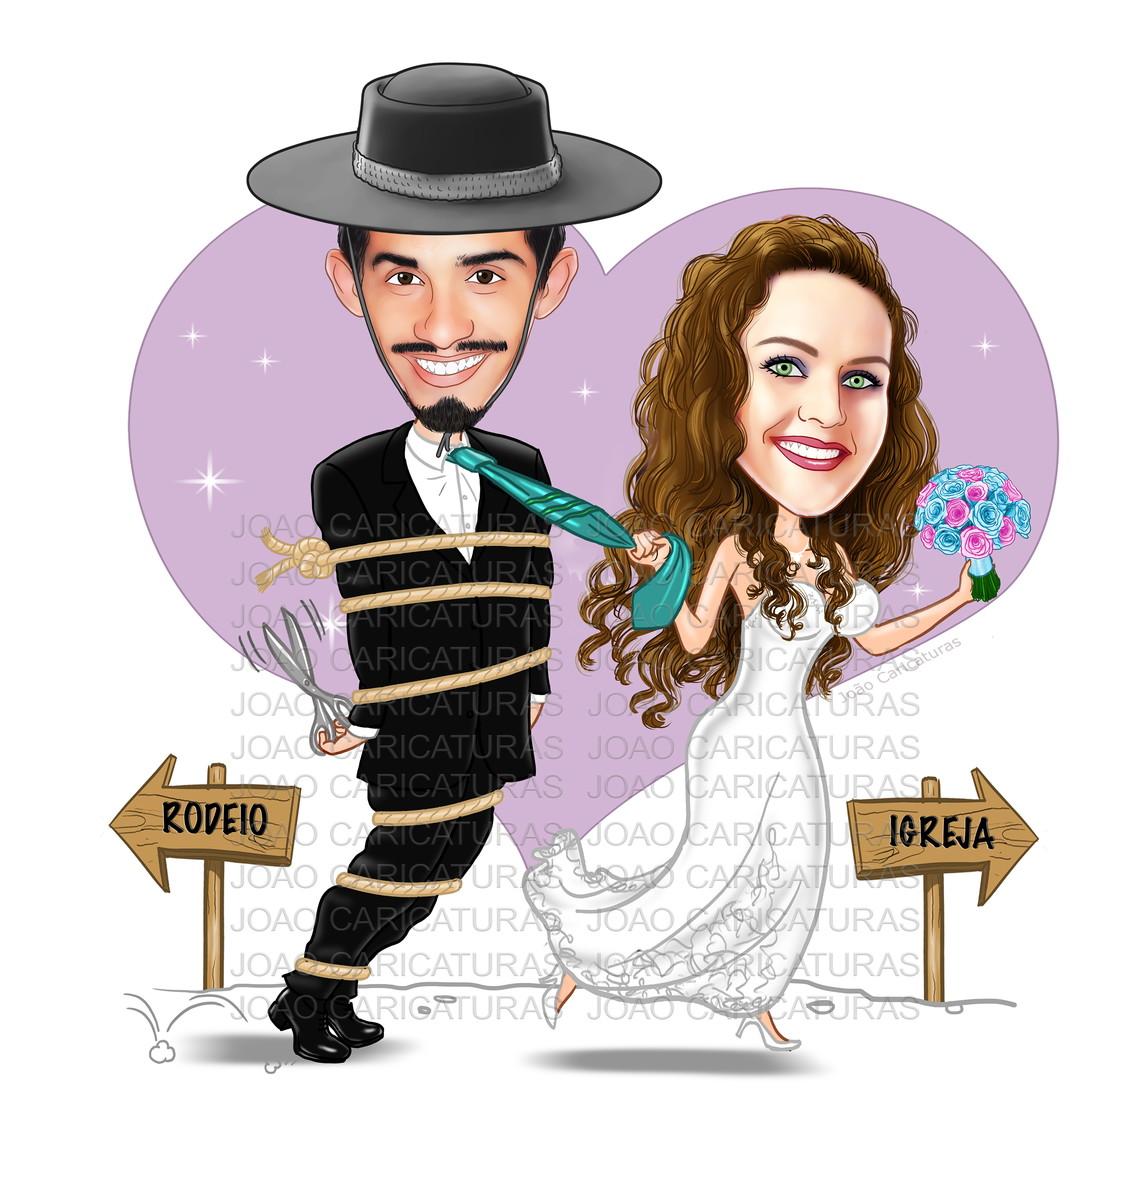 Caricatura Digital De Casal Puxando Pela Gravata Tema Gaucho No